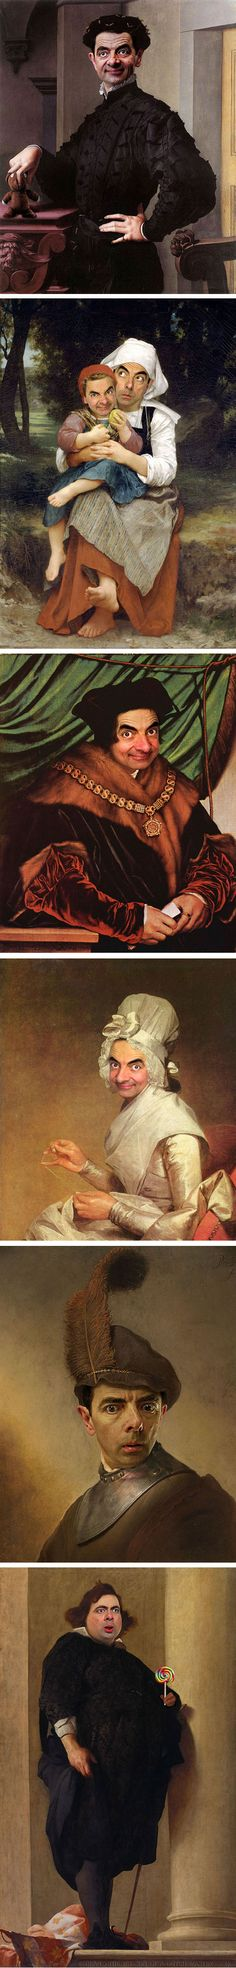 Classy Mr. Bean